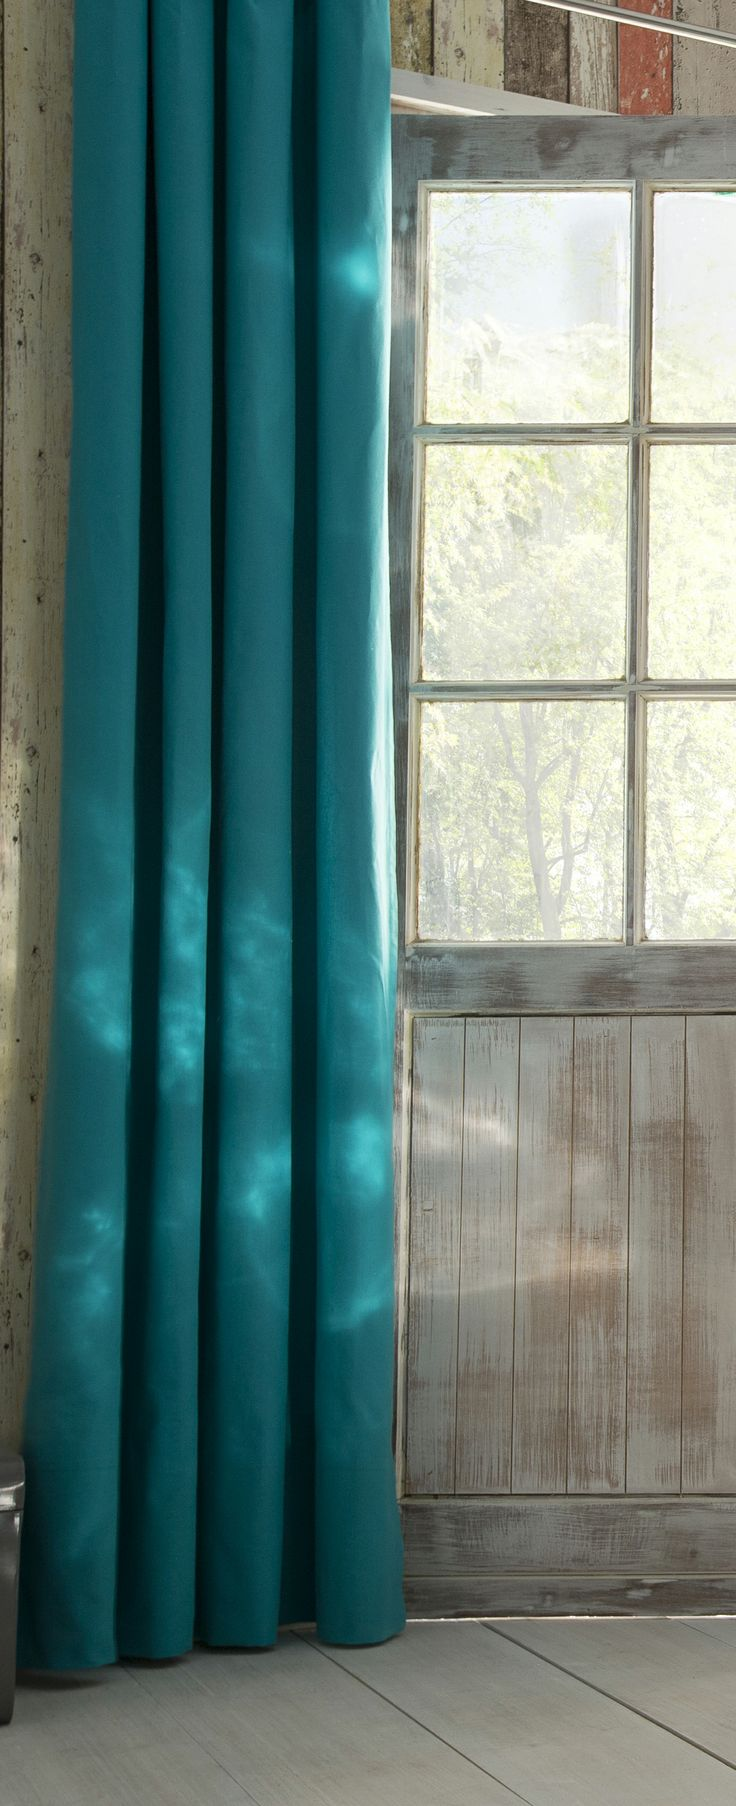 peinture bleu castorama finest peinture with peinture bleu castorama cheap full size of salle. Black Bedroom Furniture Sets. Home Design Ideas